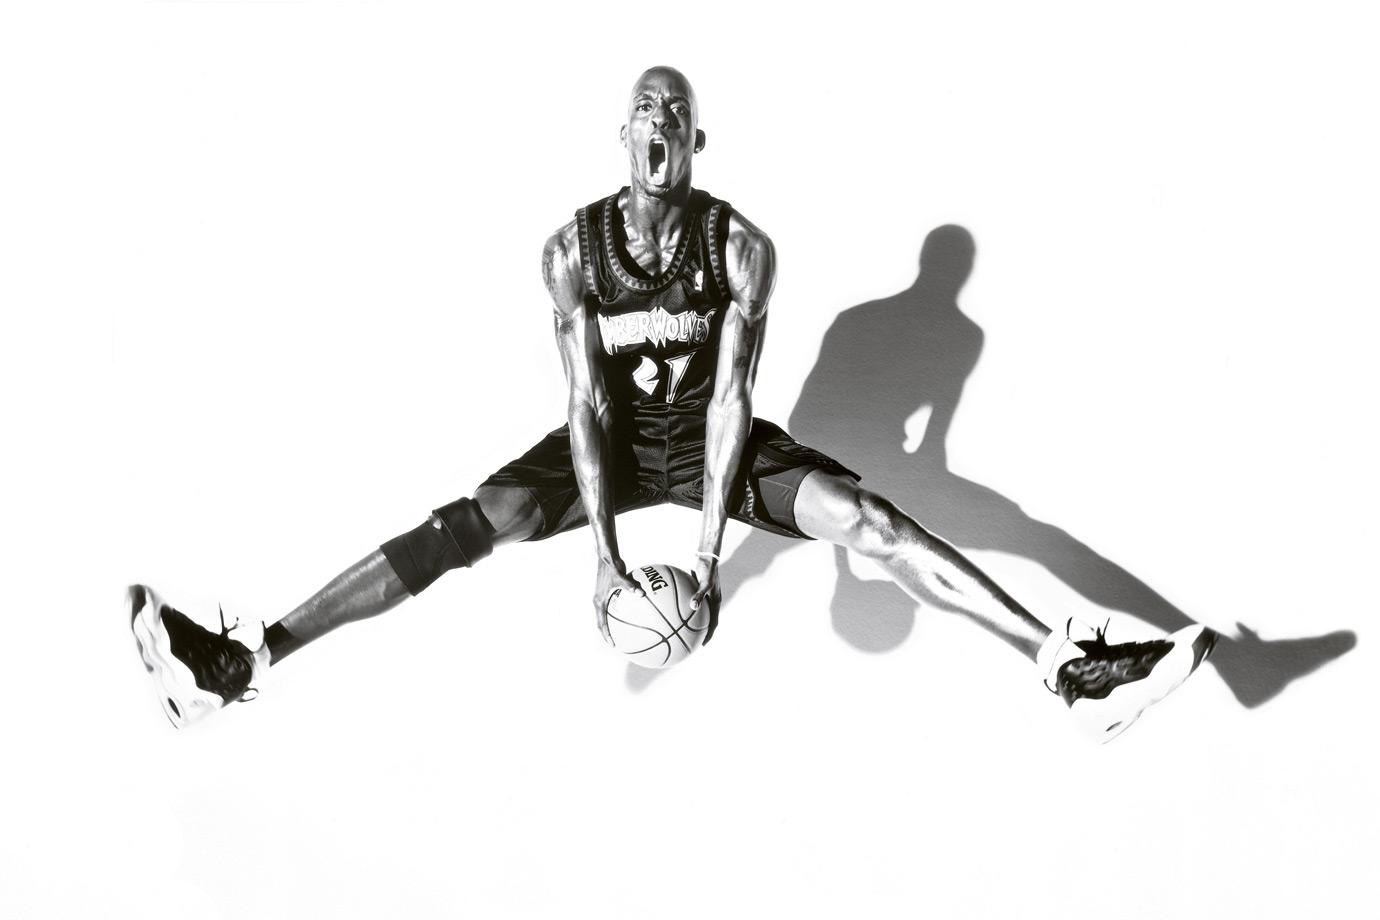 Kevin Garnett strikes a pose.